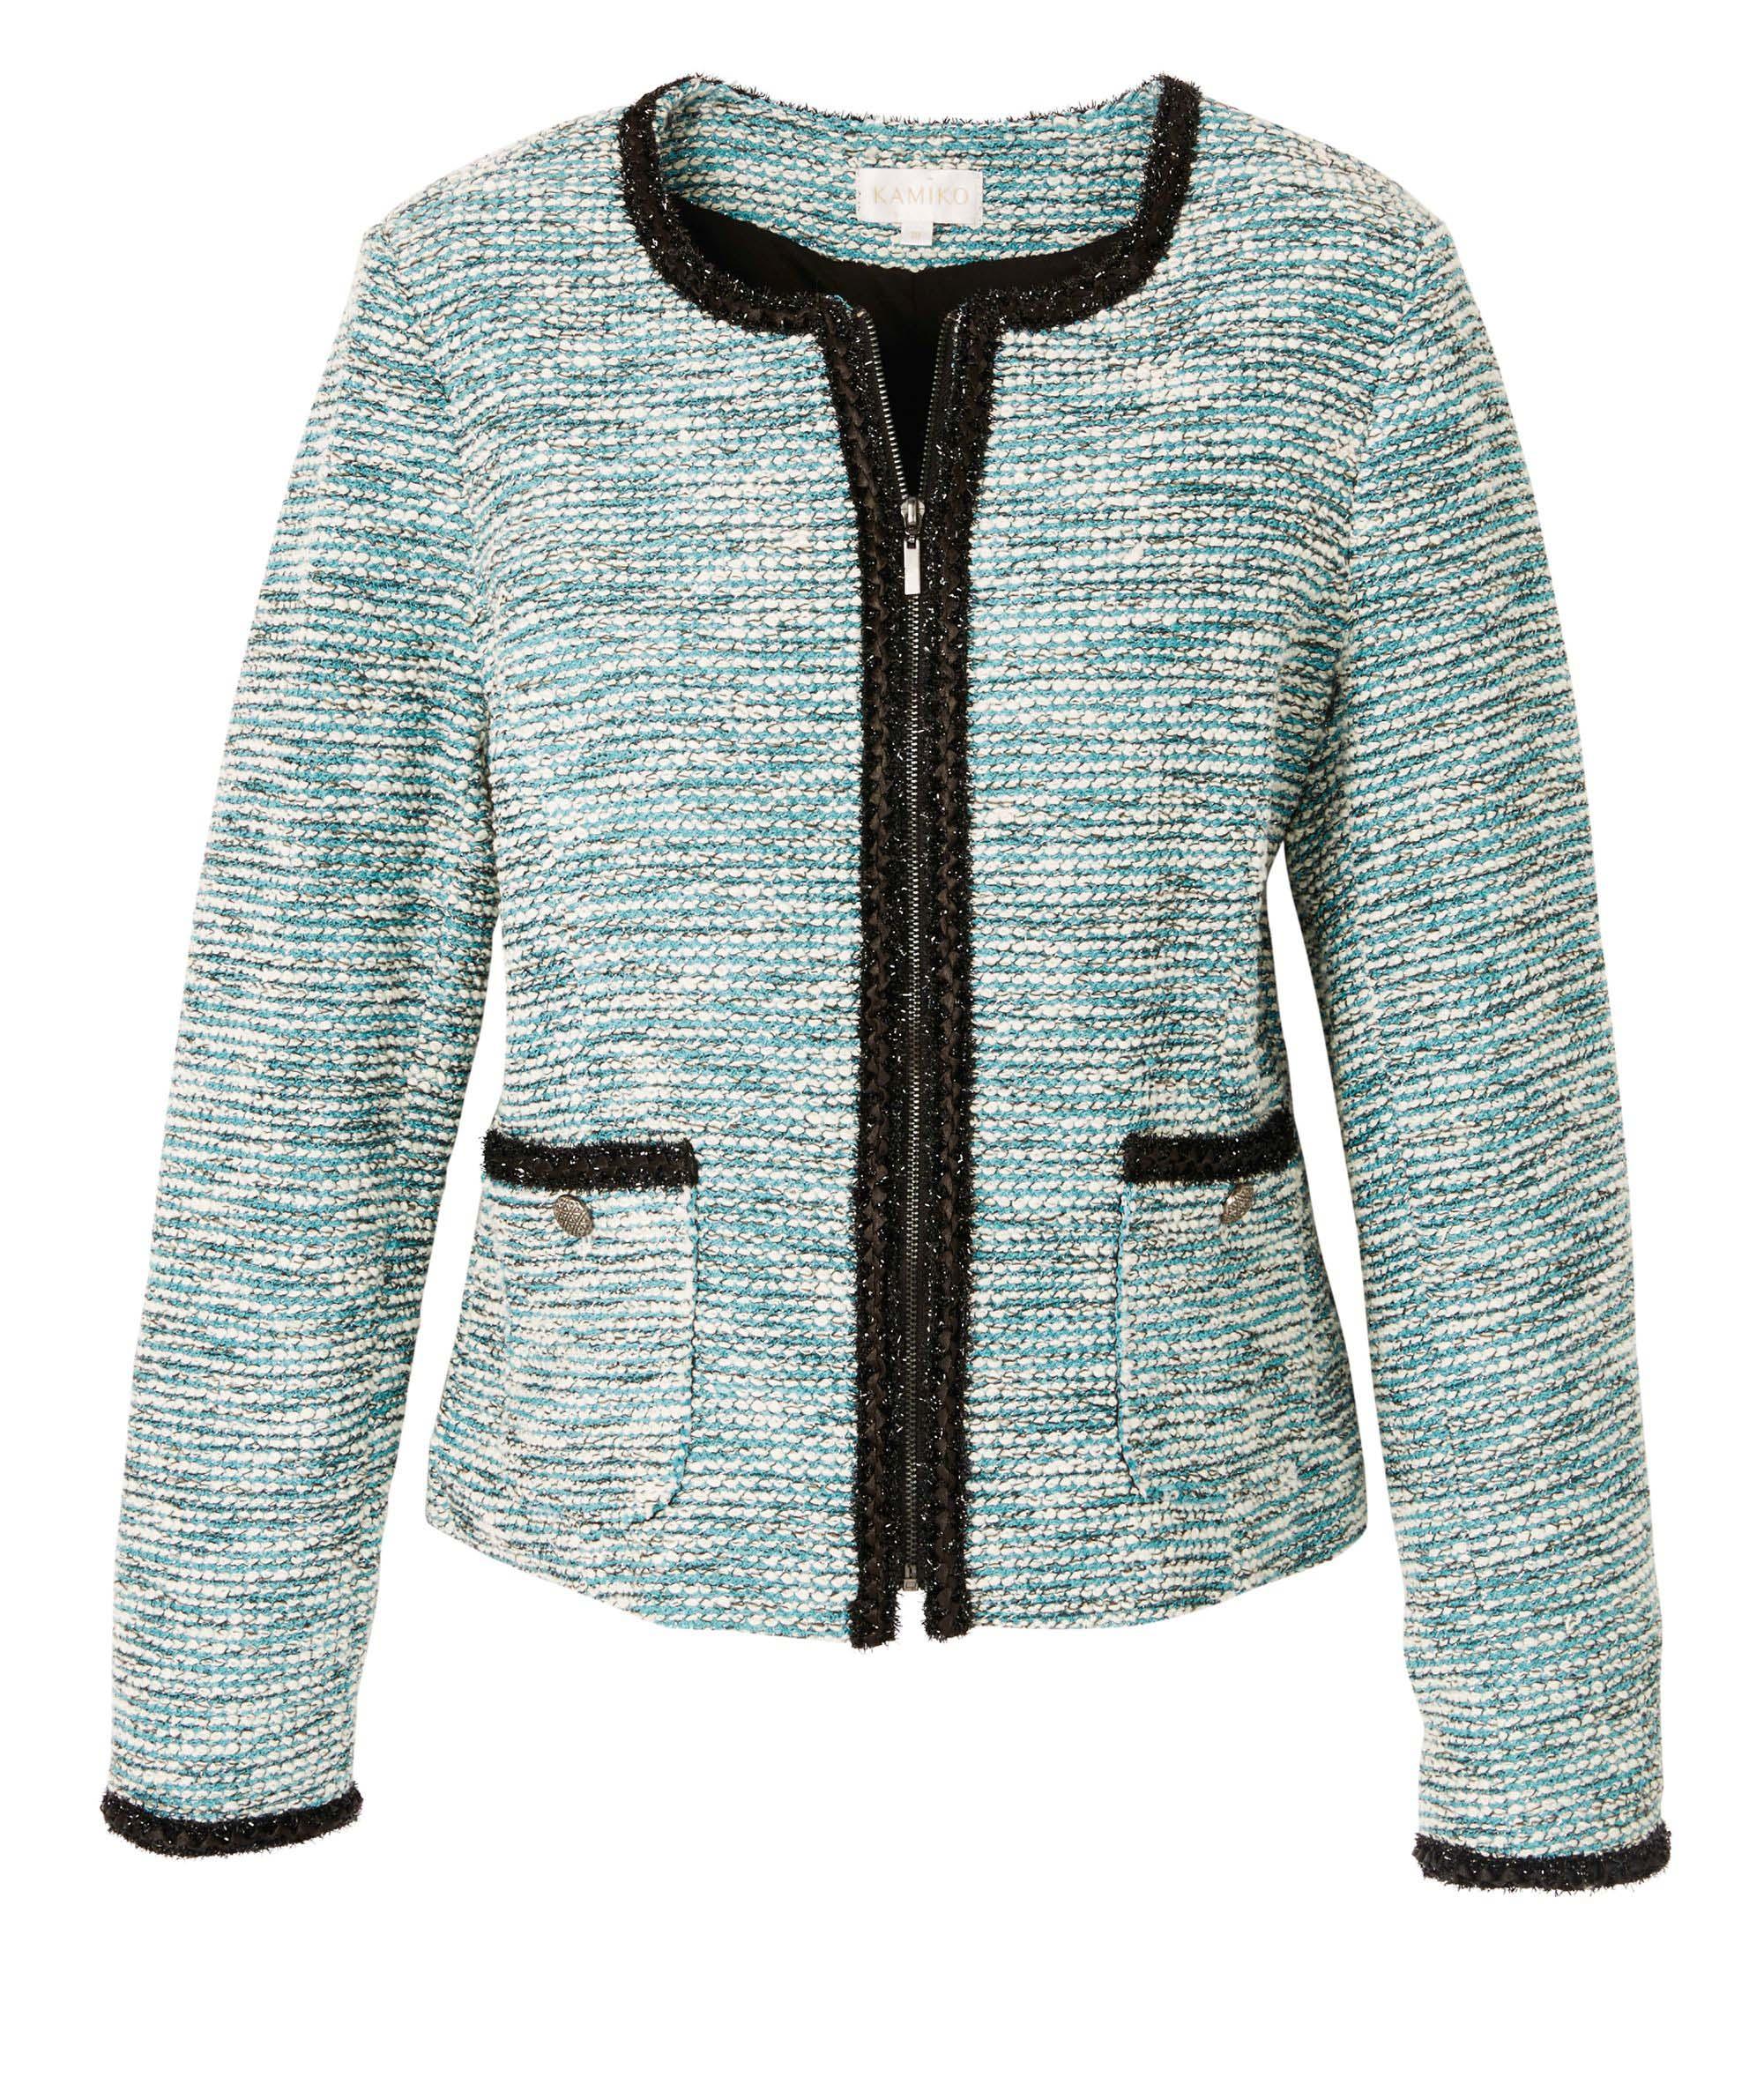 6092608 Kamiko Jadeboucle Jacket Emerald $159.99 Instore 3 March 2016